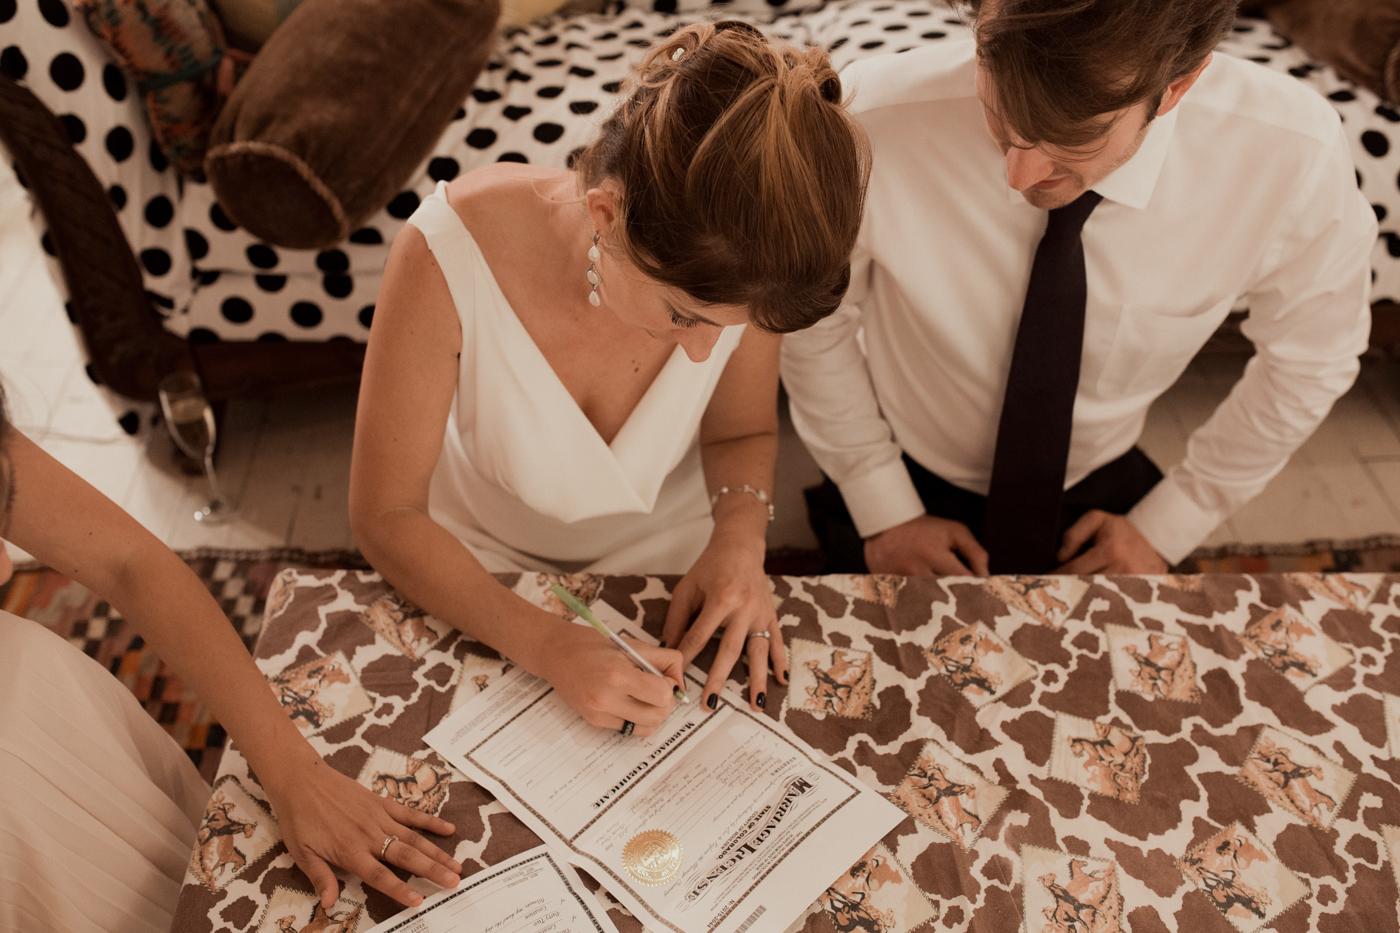 boulder-museum-modern-art-colorado-wedding-133.jpg